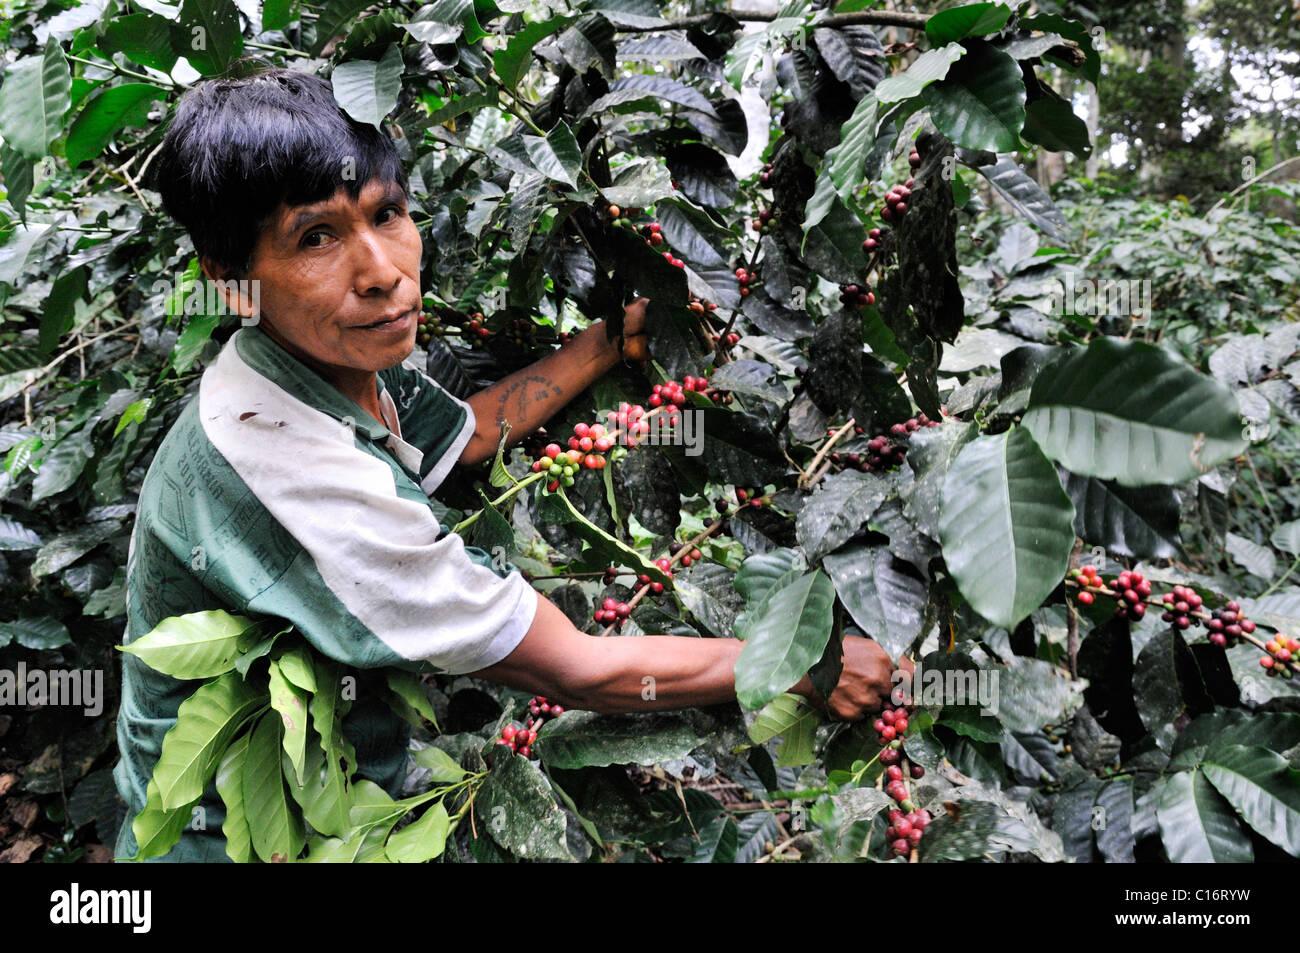 Farmer harvesting coffee, ecological cultivation, Fair Trade Stock Photo: 35185917 - Alamy